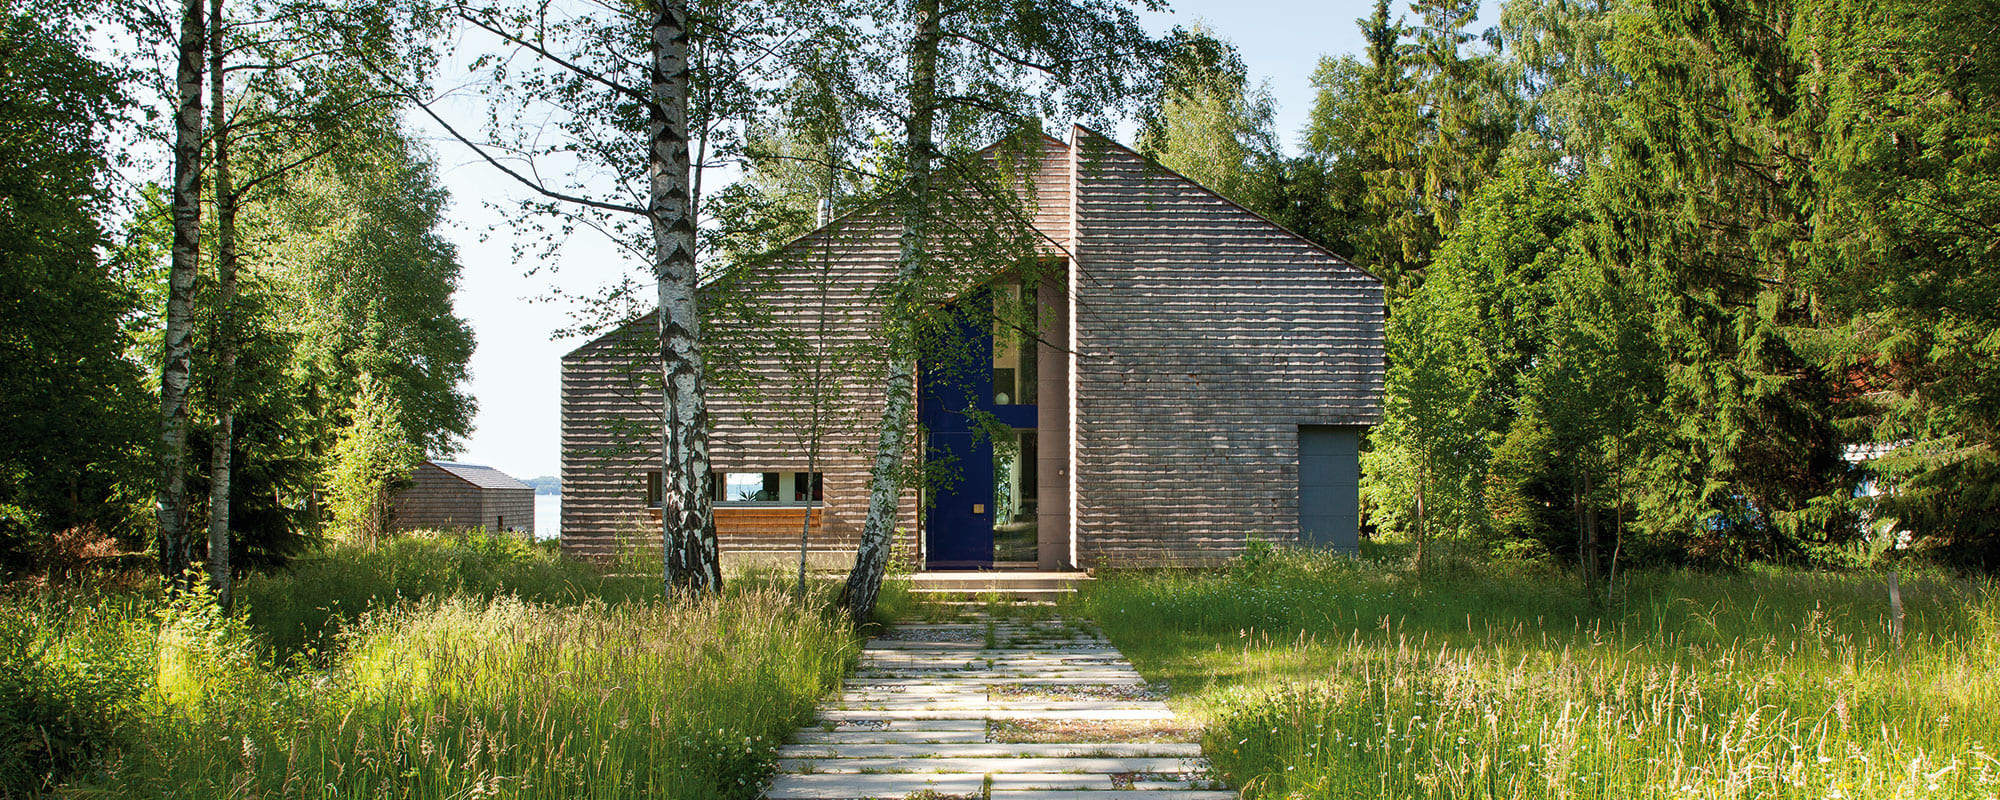 Stephan Maria Lang, Seeshaupt, Haus K, Bootshaus